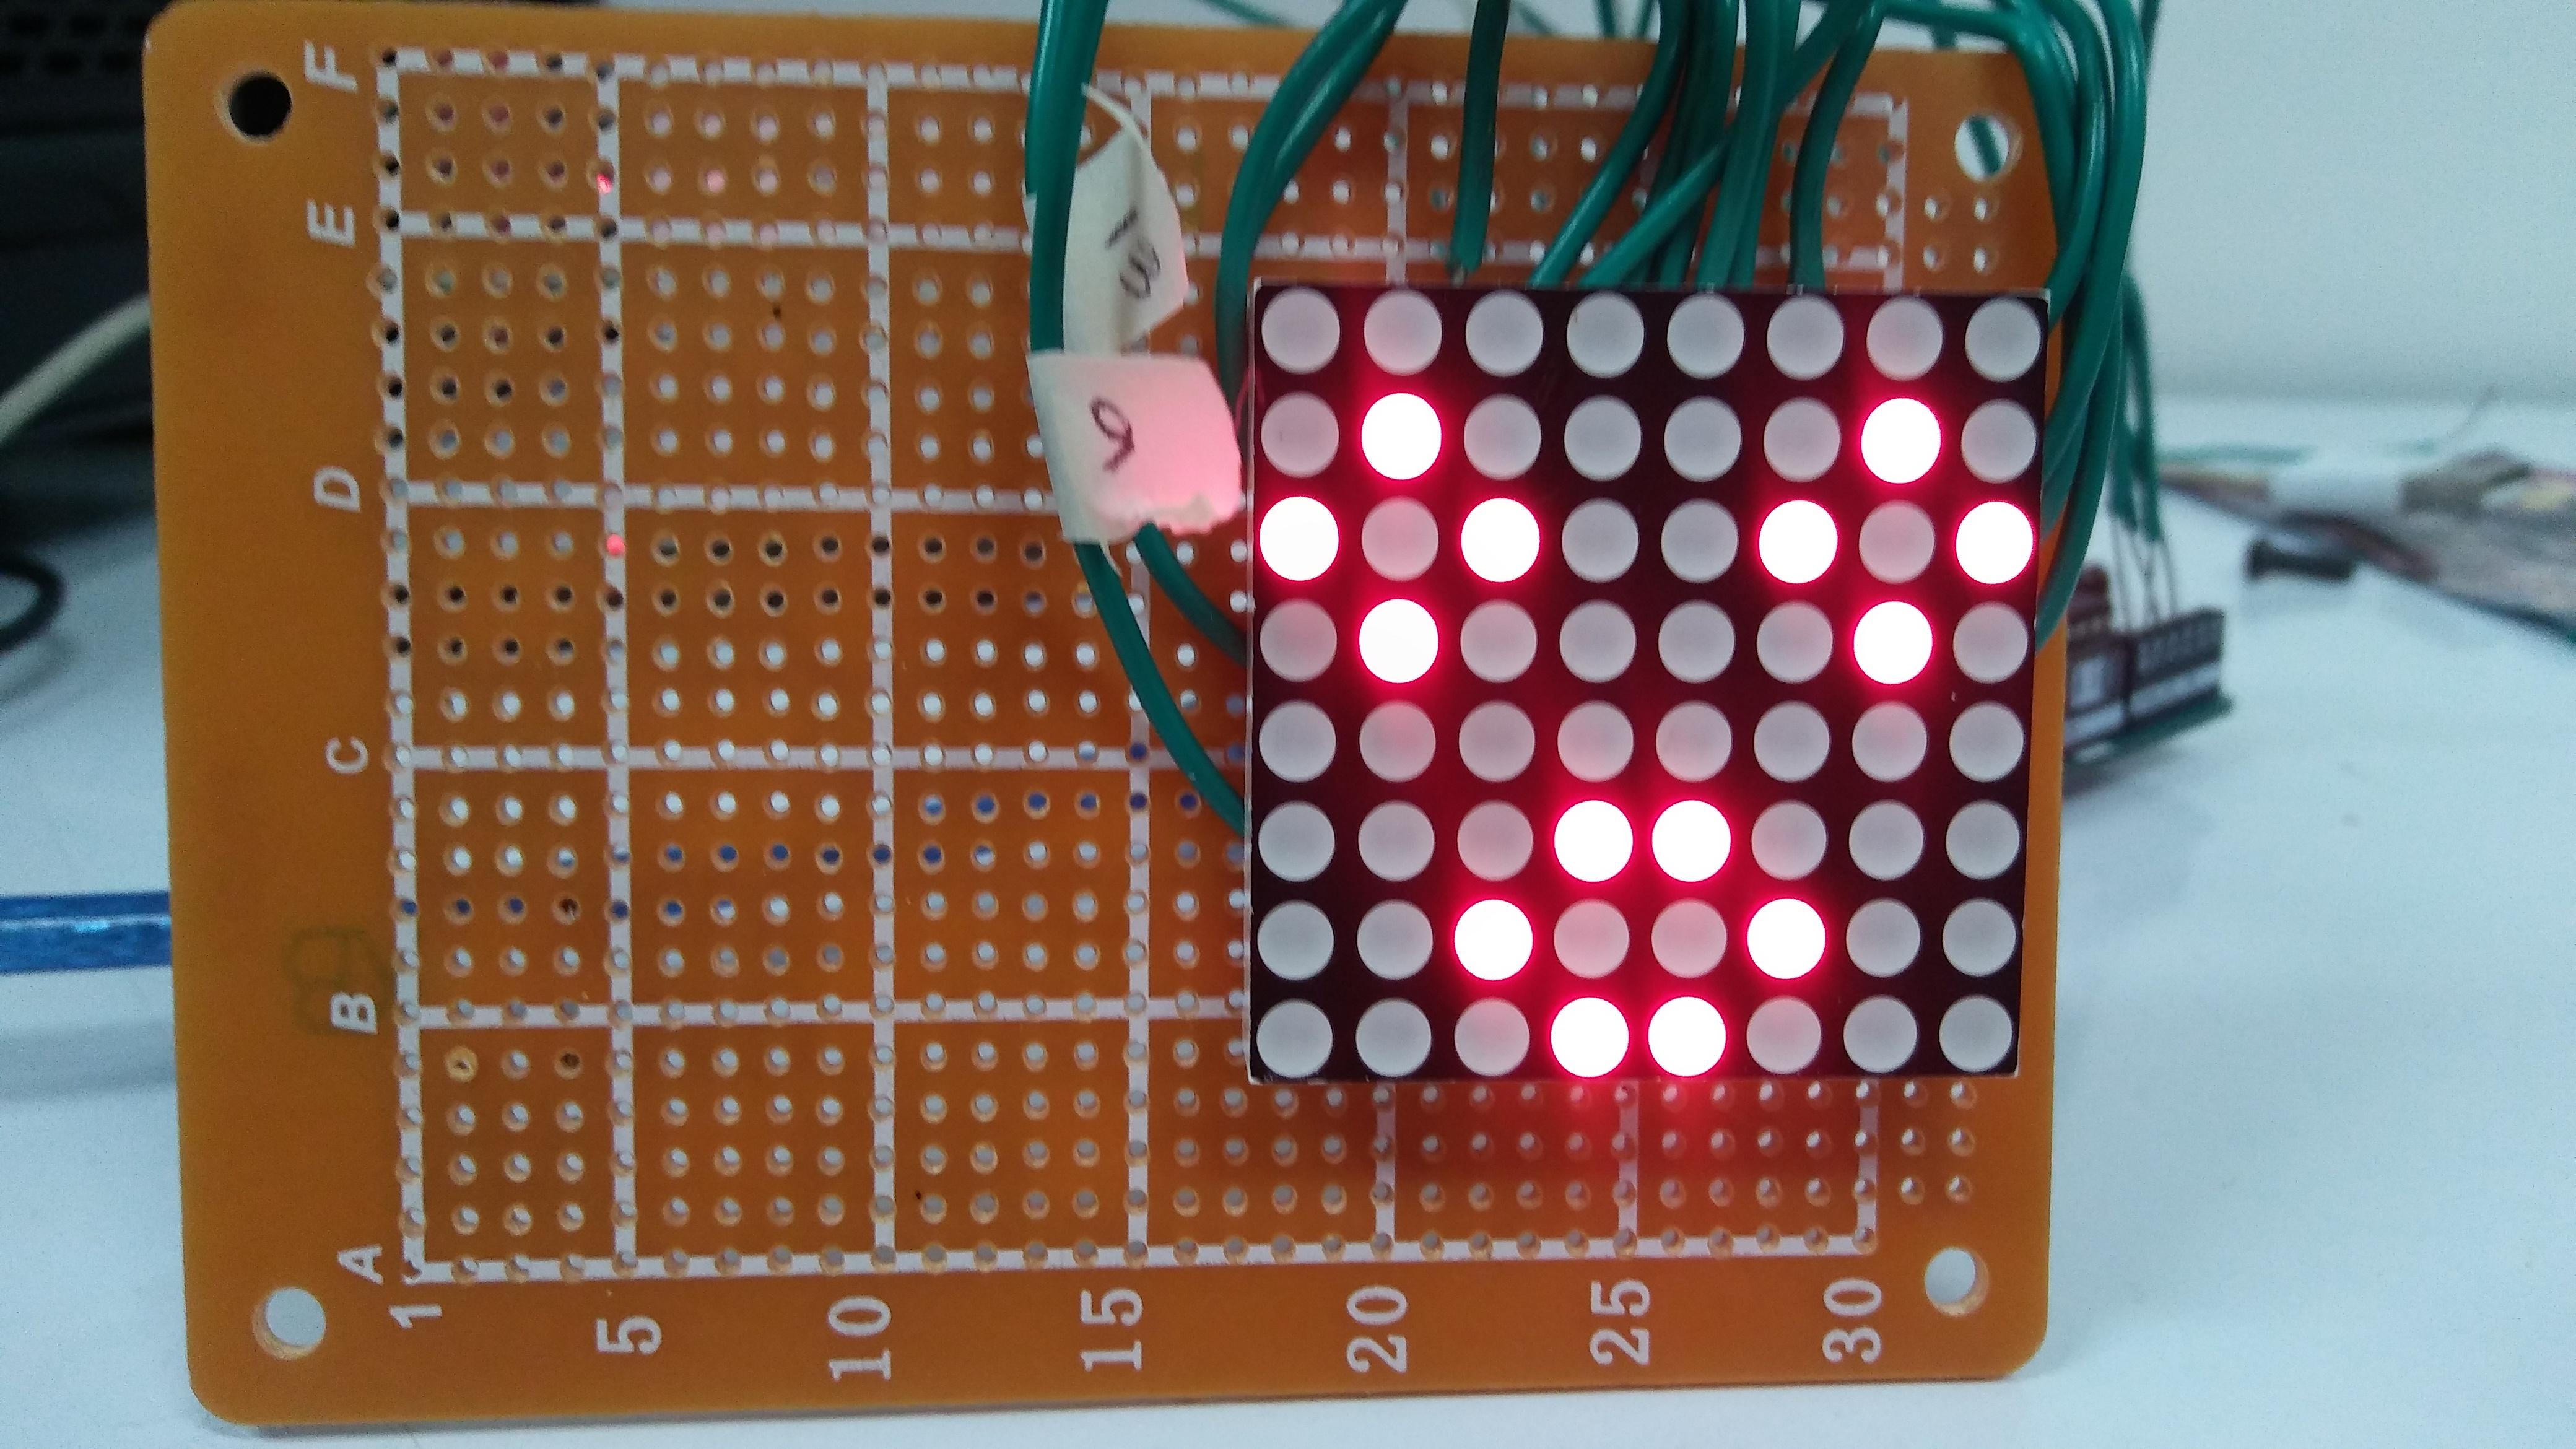 Picture of 8x8 LED Matrix Using Arduino